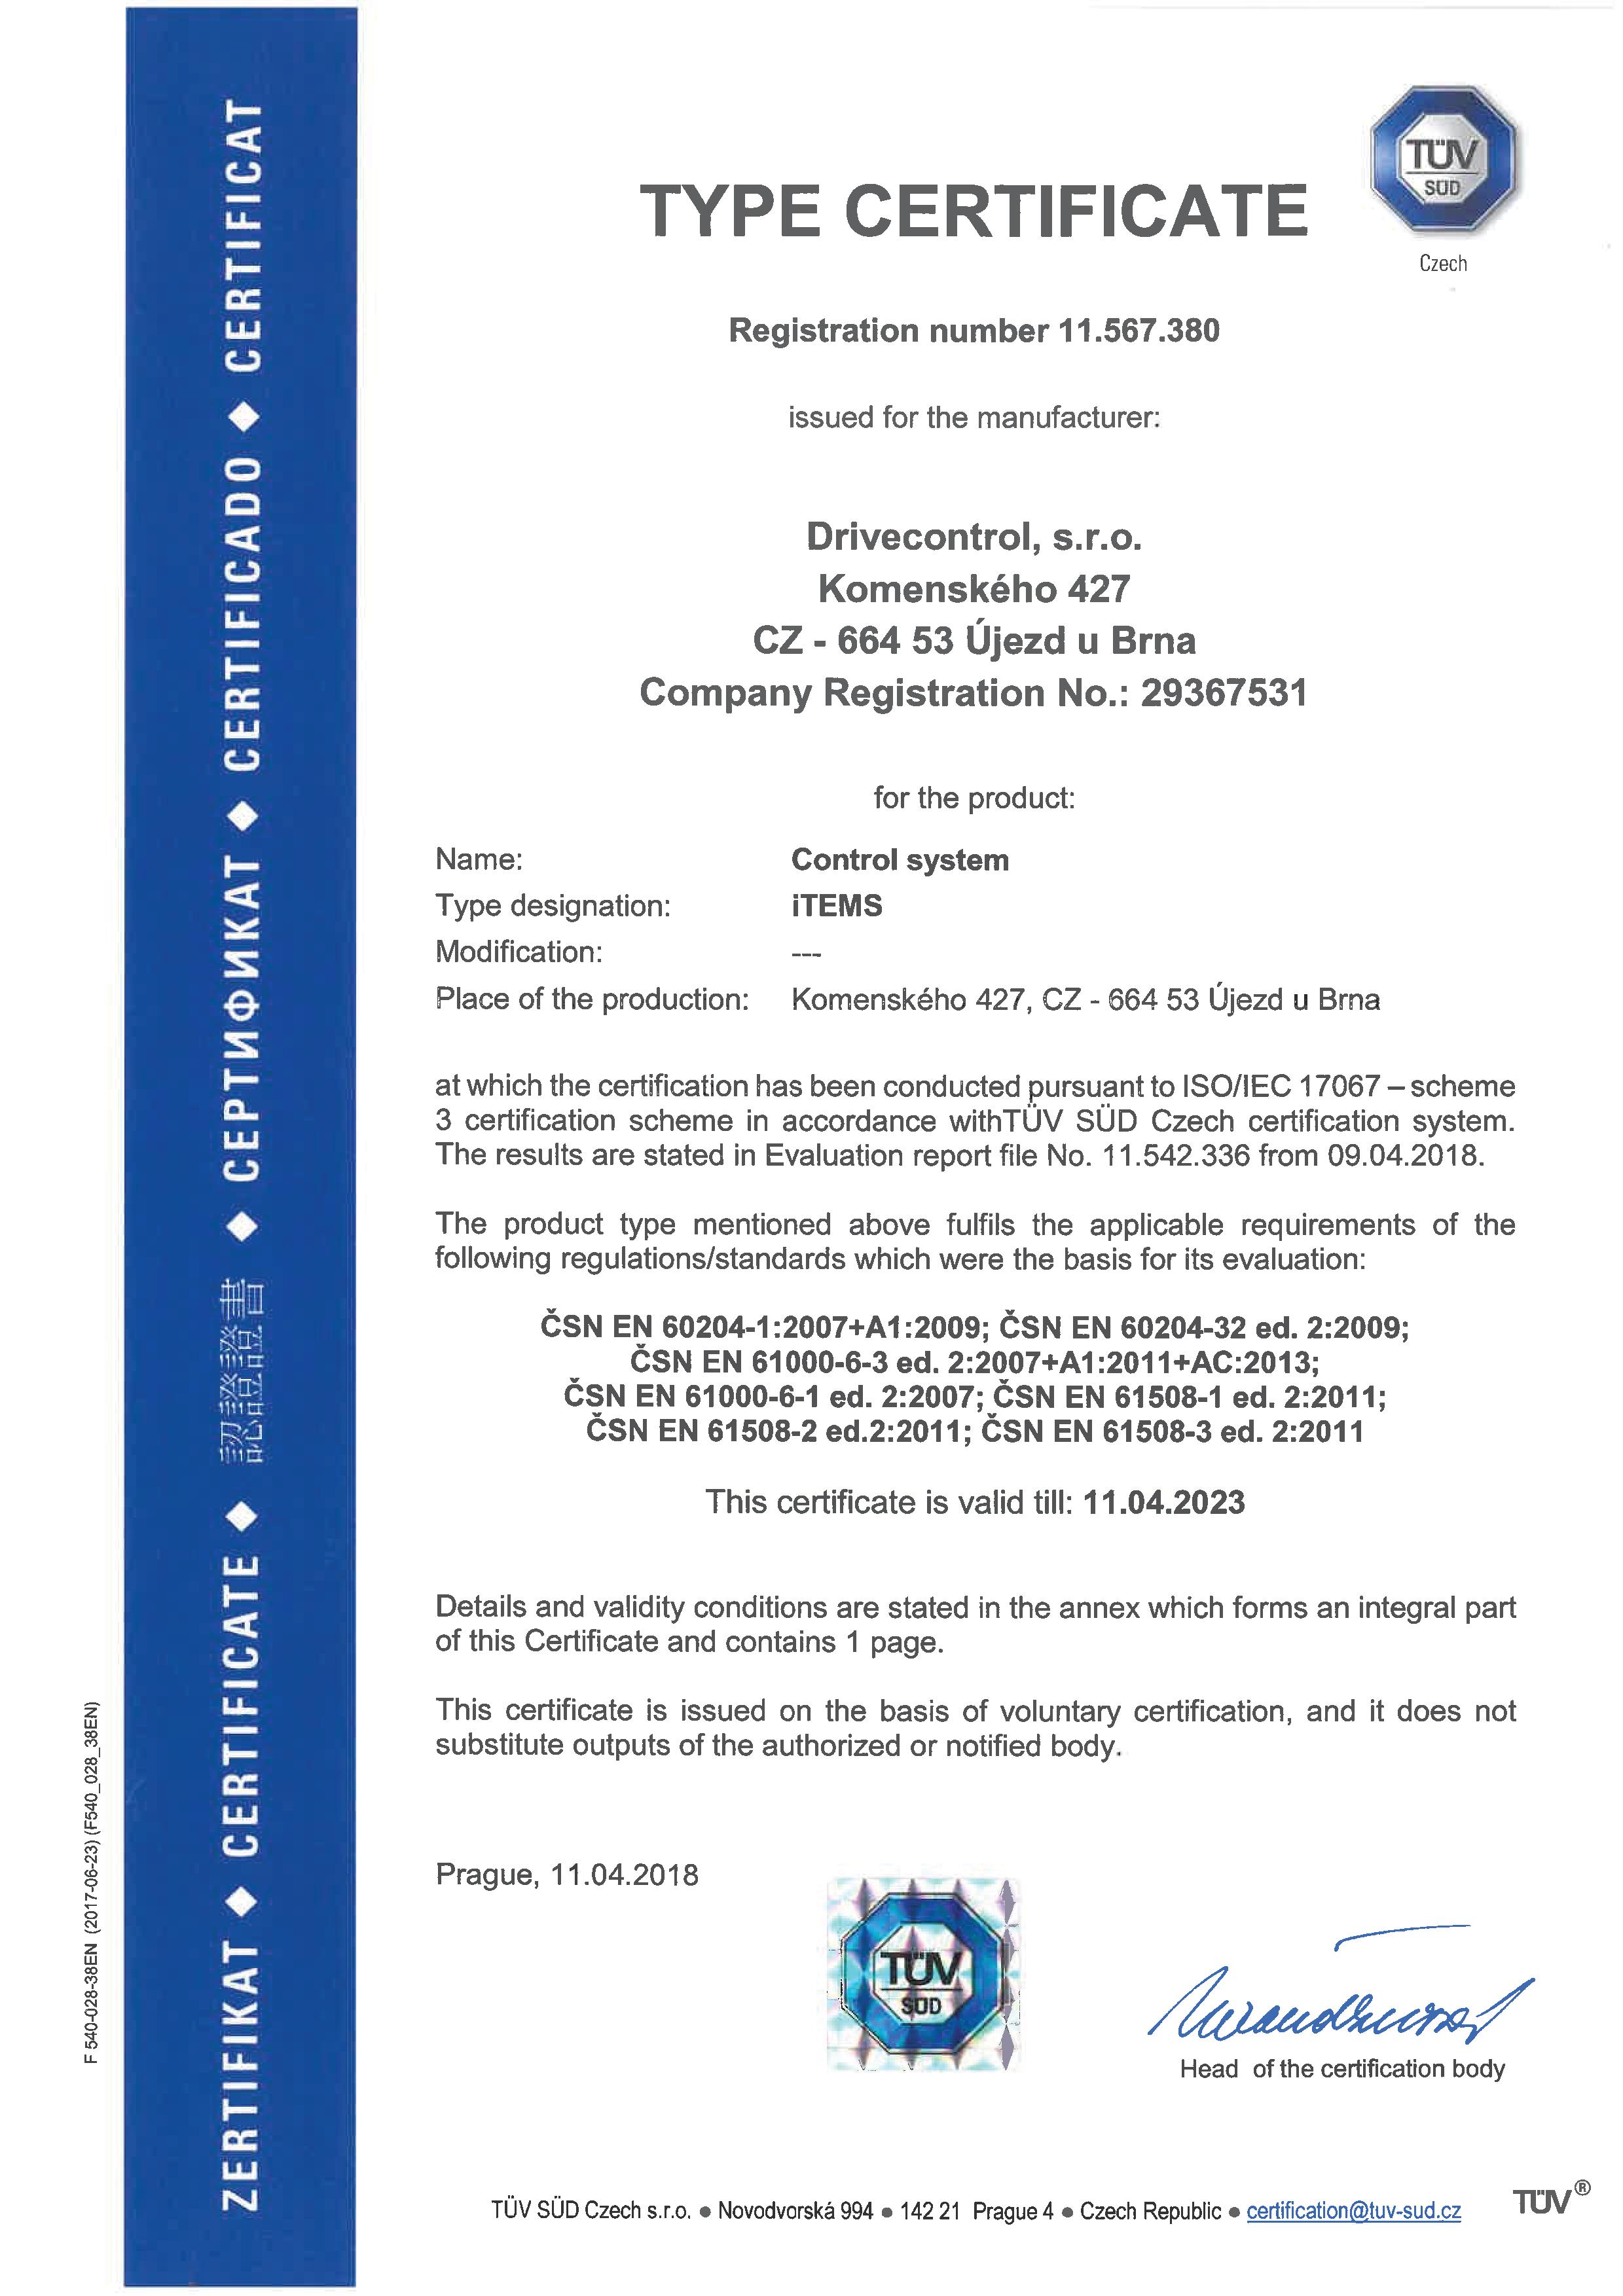 SIL 3 certificate